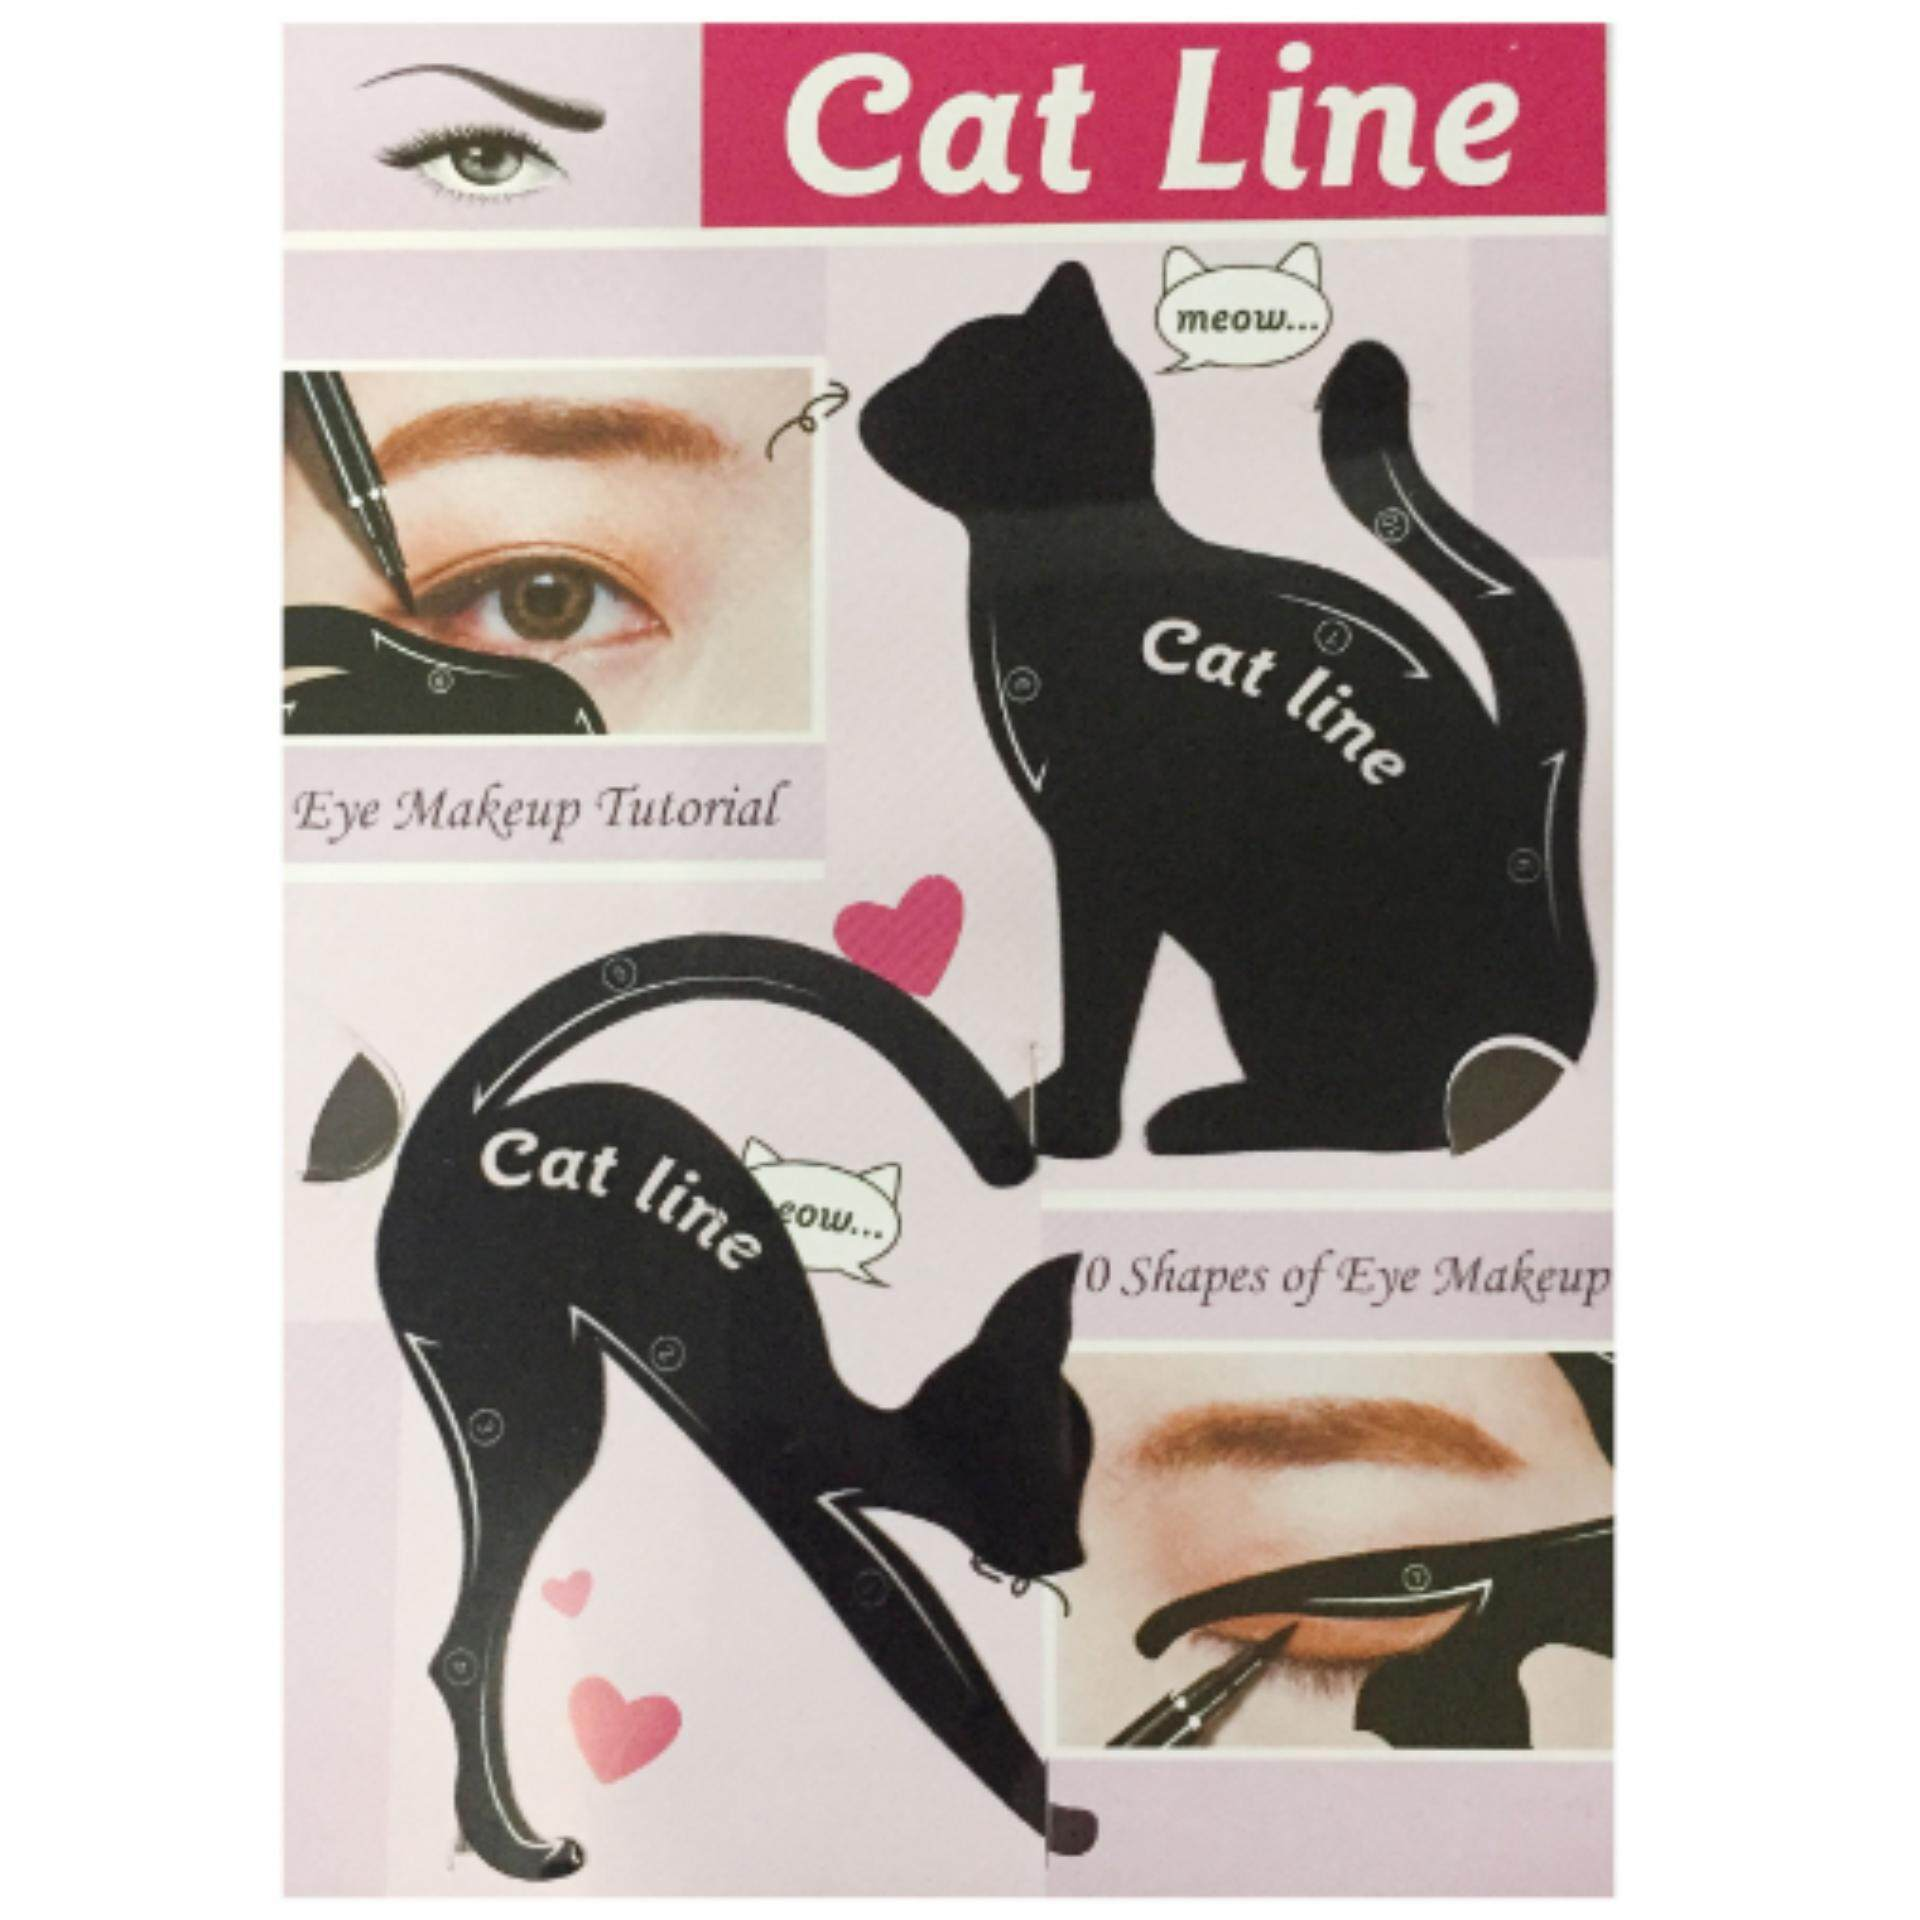 Kucing Line Eye Makeup Alat Eyeliner Stensil Template Shaper Model Qty: 2 Set-Intl